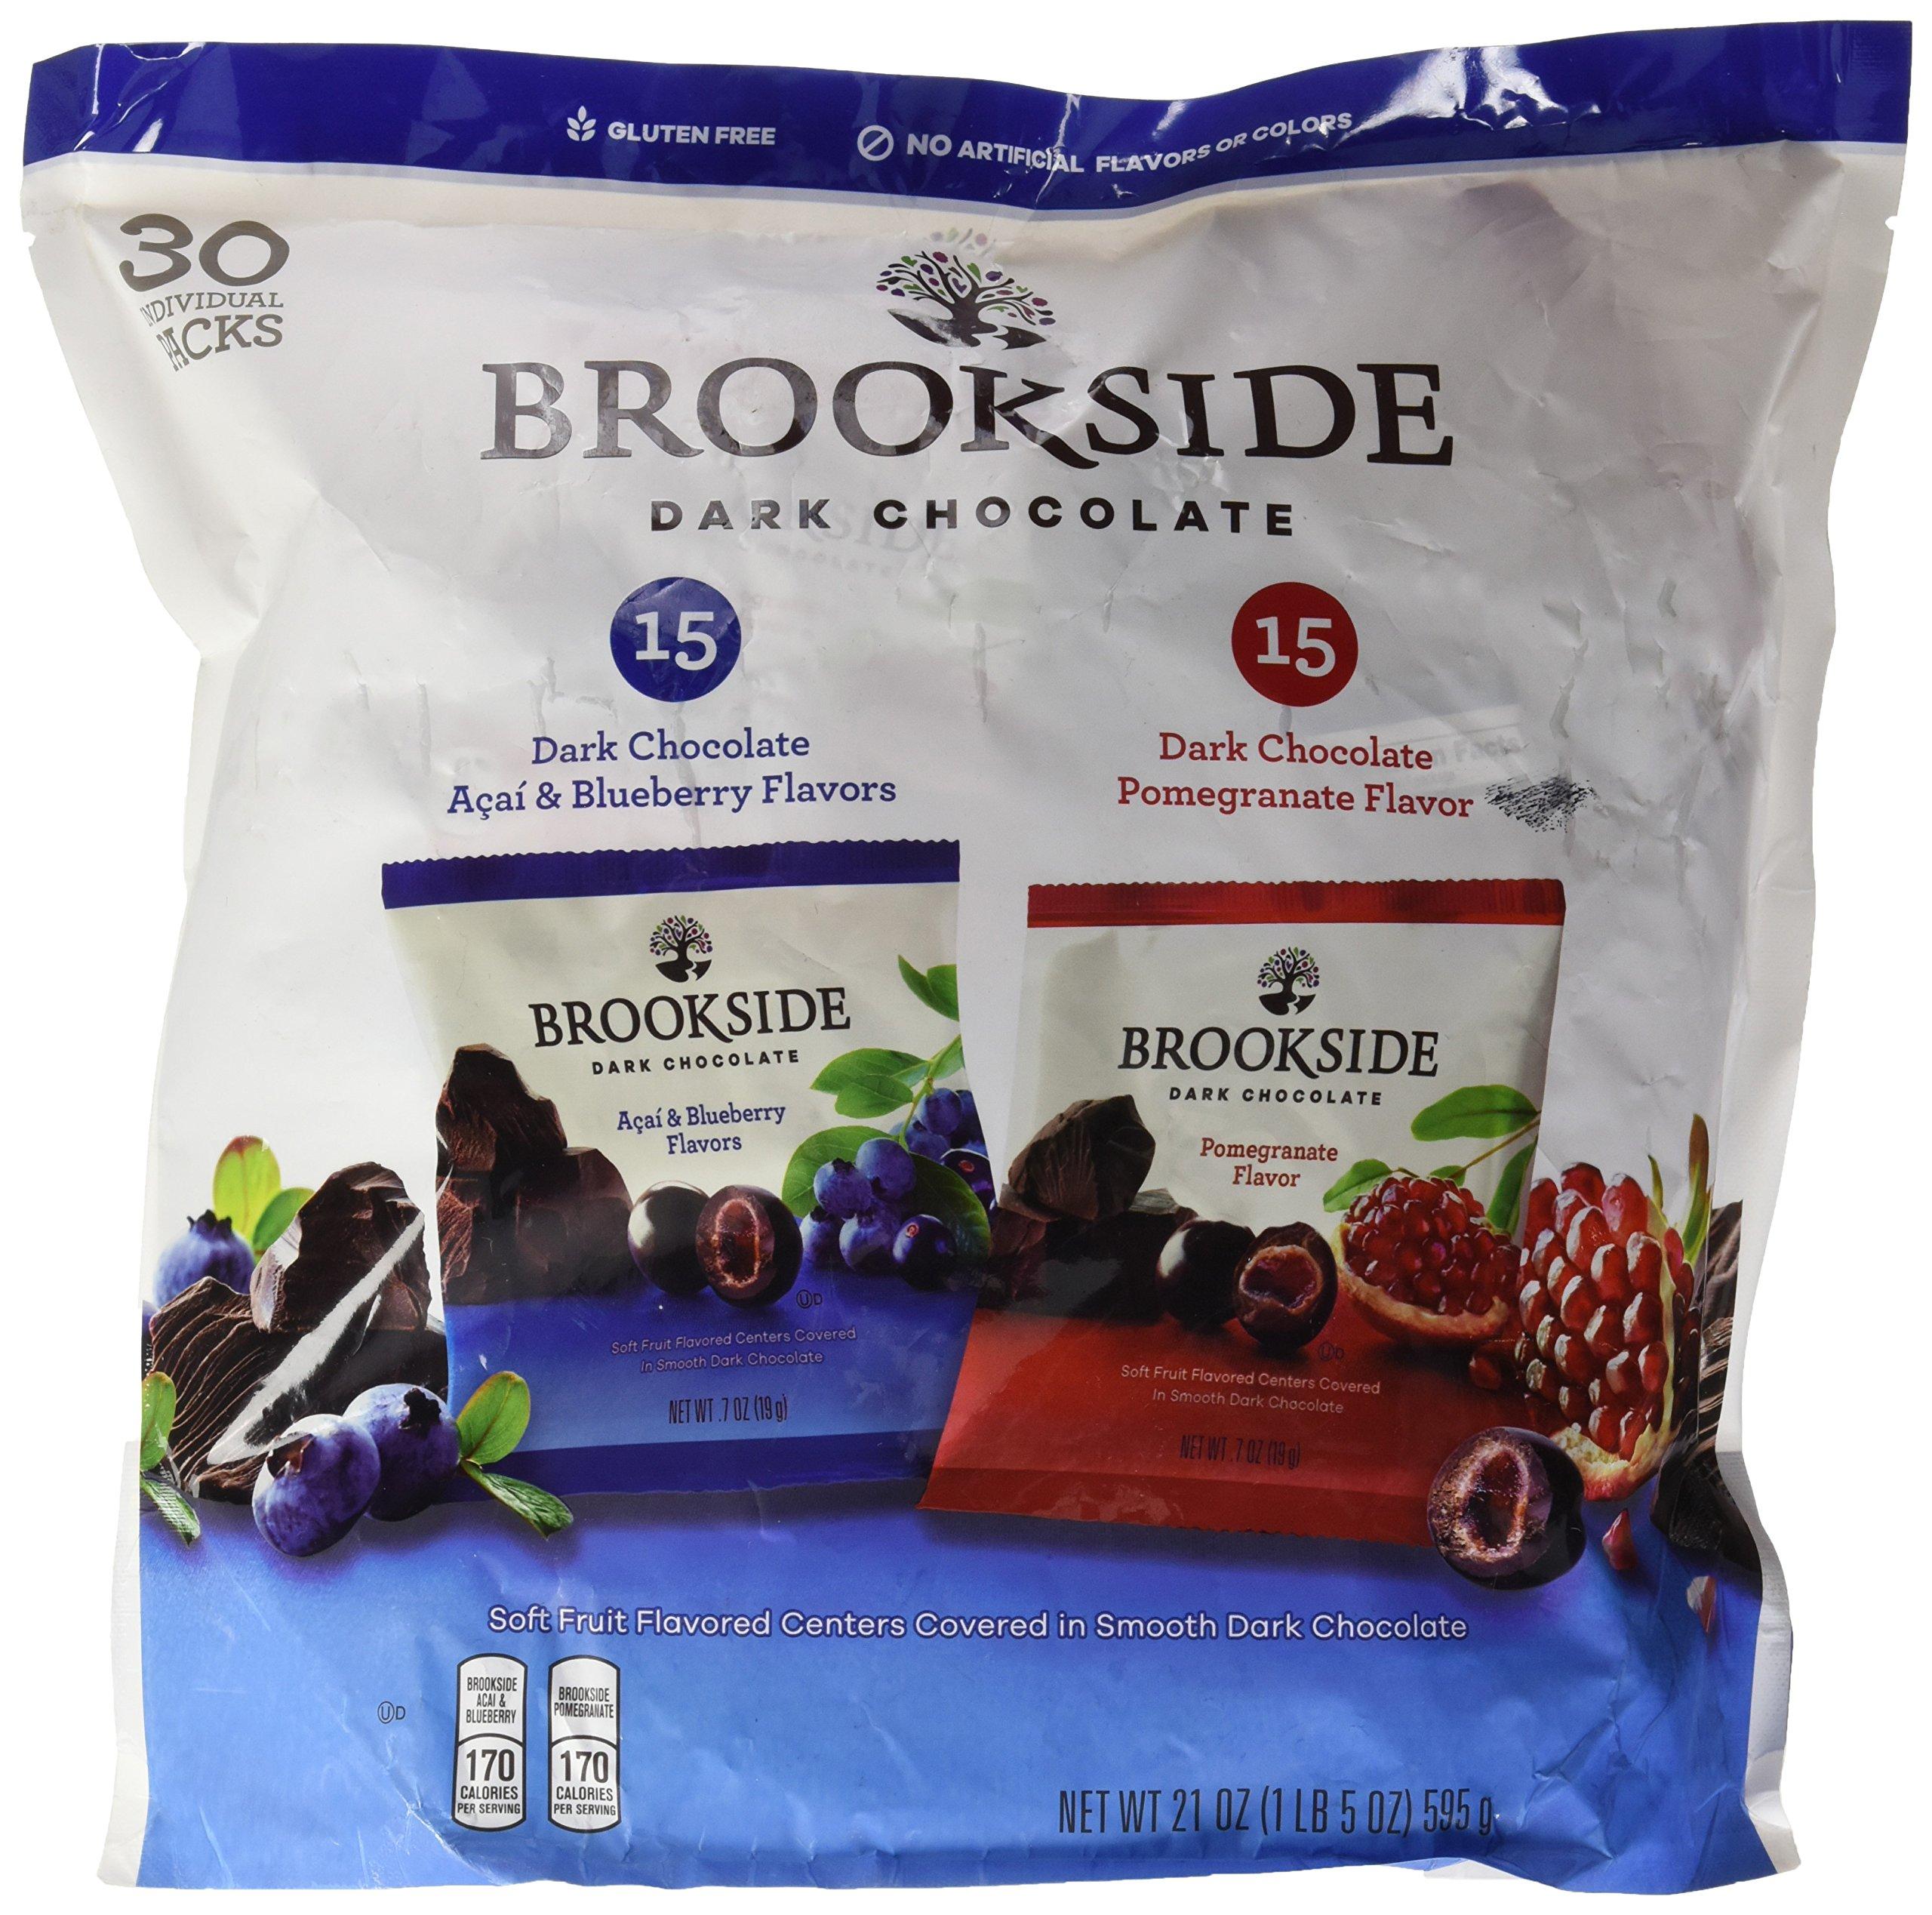 Brookside Dark Chocolate Variety Pack, 21 Ounce